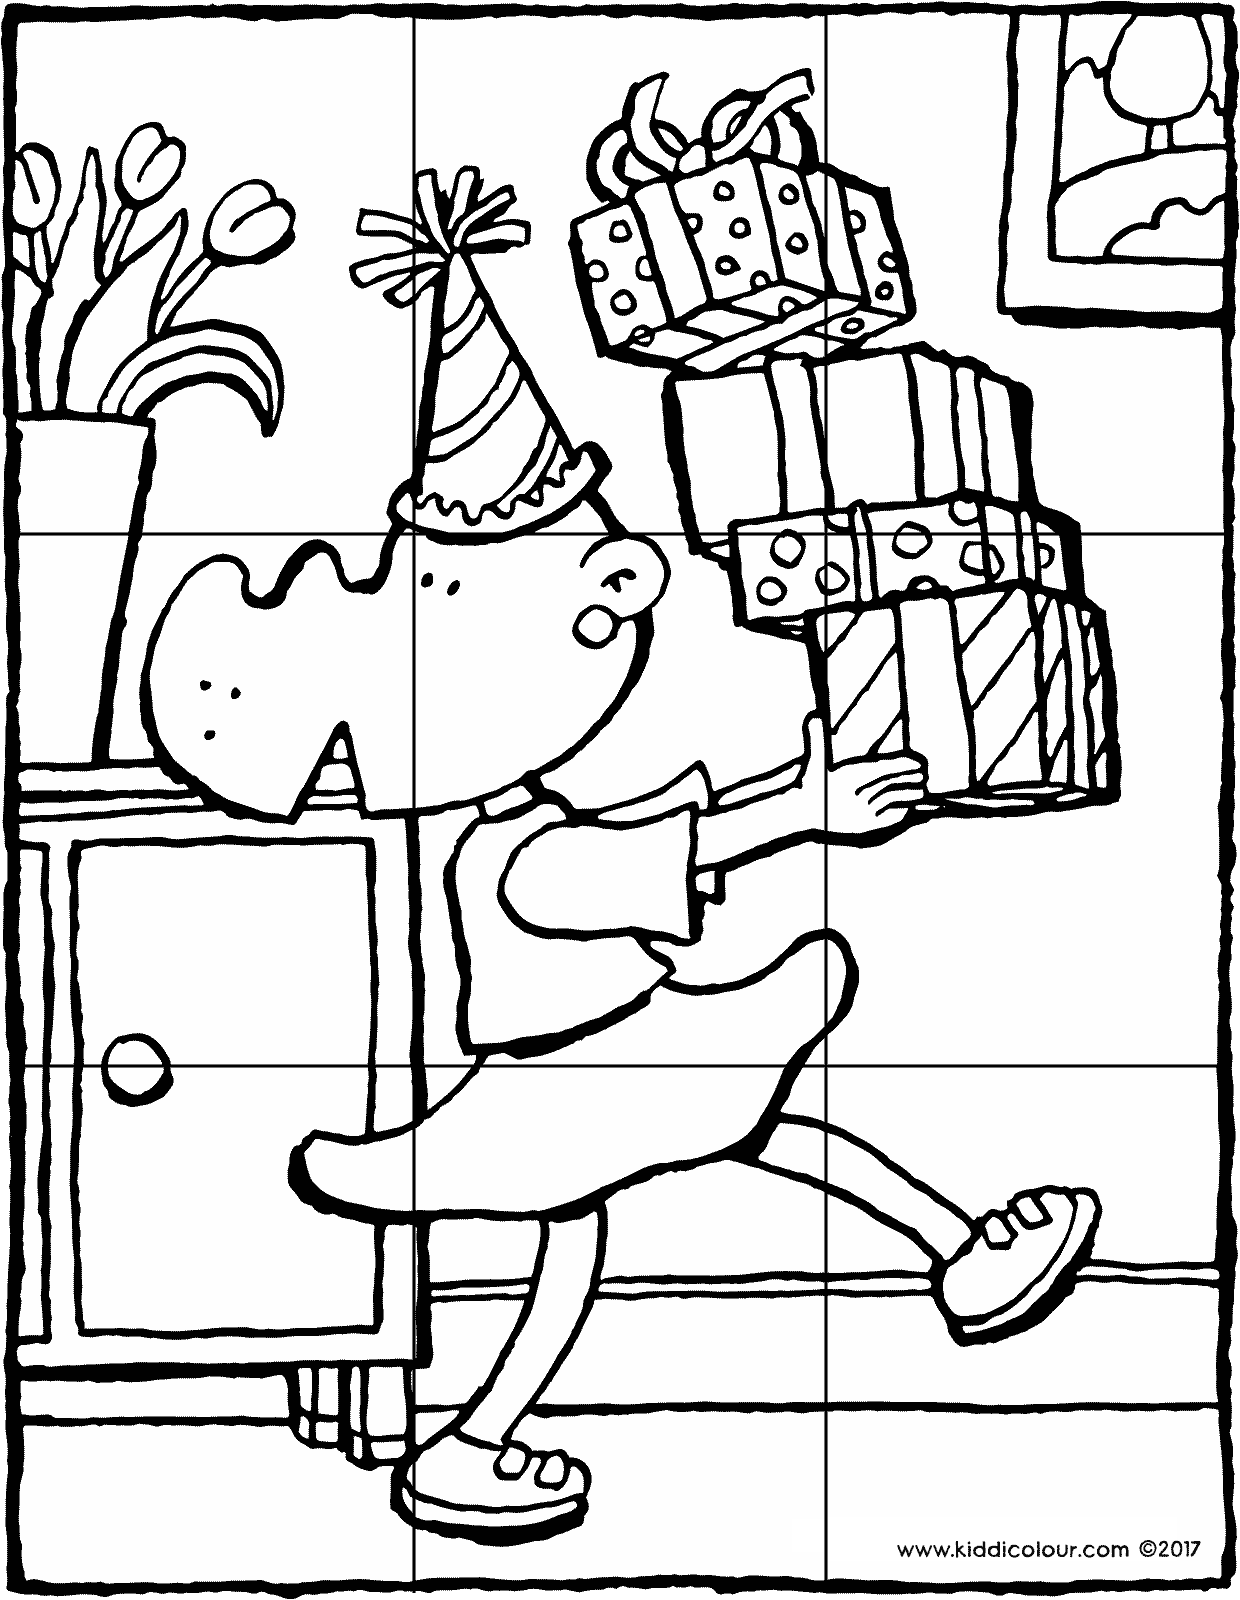 Www Kinder Malvorlagen Com Puzzle - tiffanylovesbooks